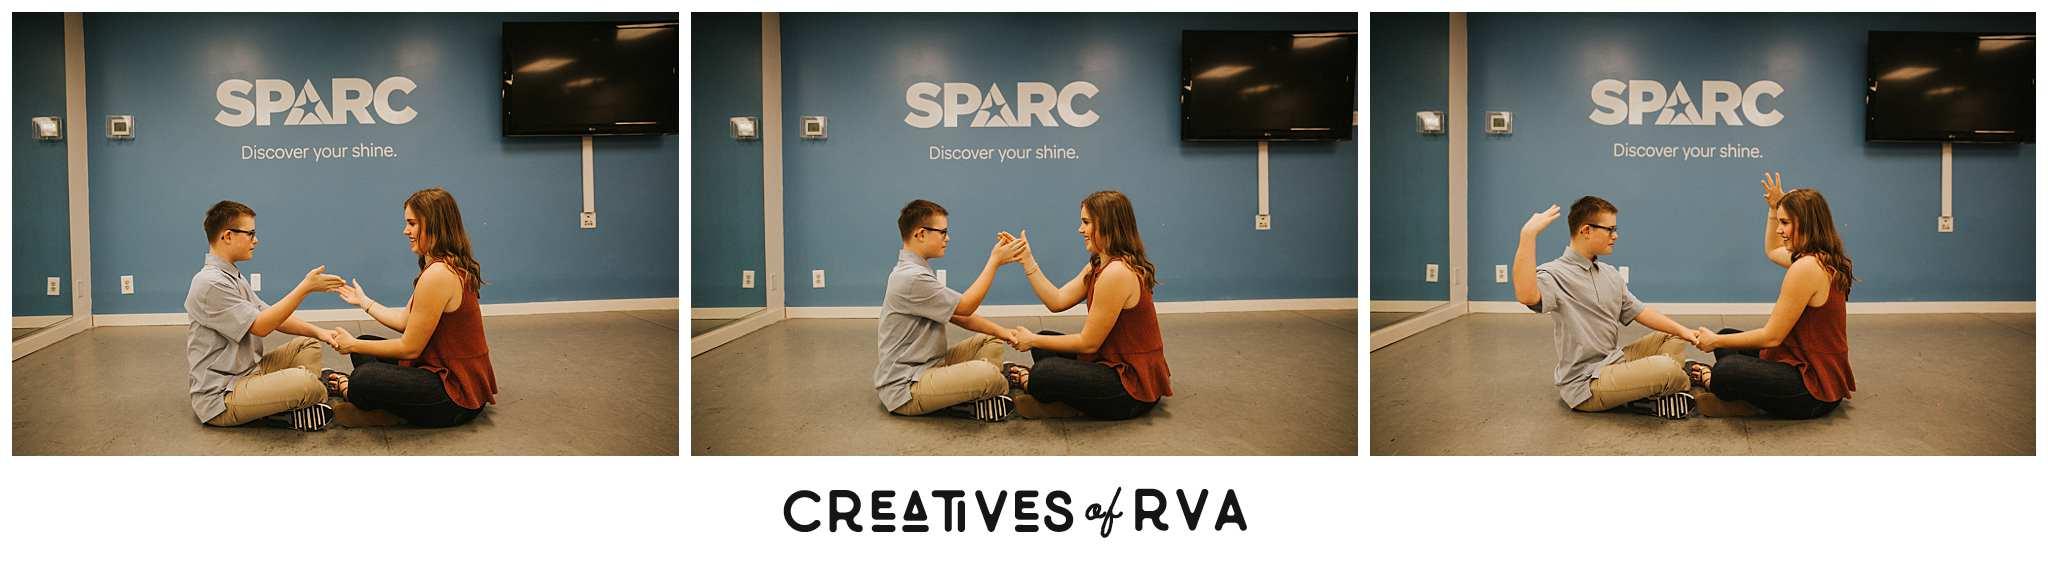 SPARC-FIRST-FRIDAYS-LIVE-ART-GIANNA-GRACE-PHOTOGRAPHY_0016.jpg